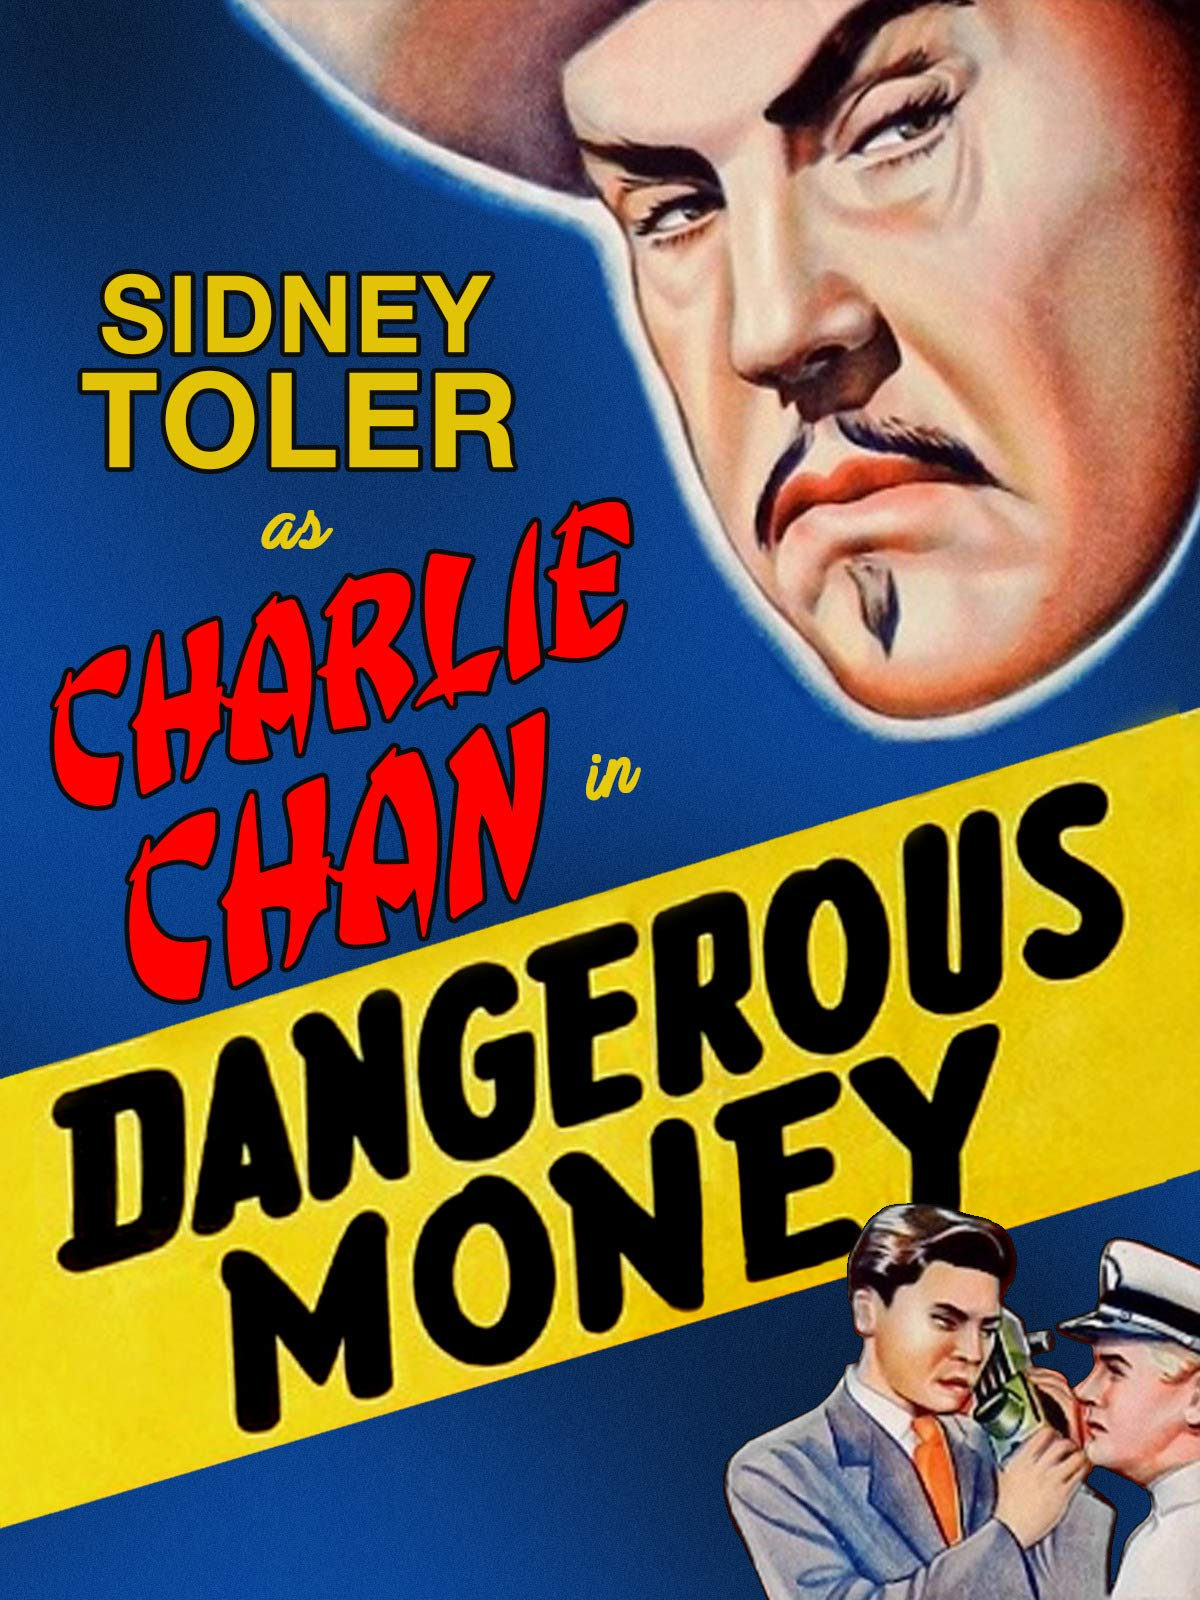 Dangerous Money - Sidney Toler As Charlie Chan